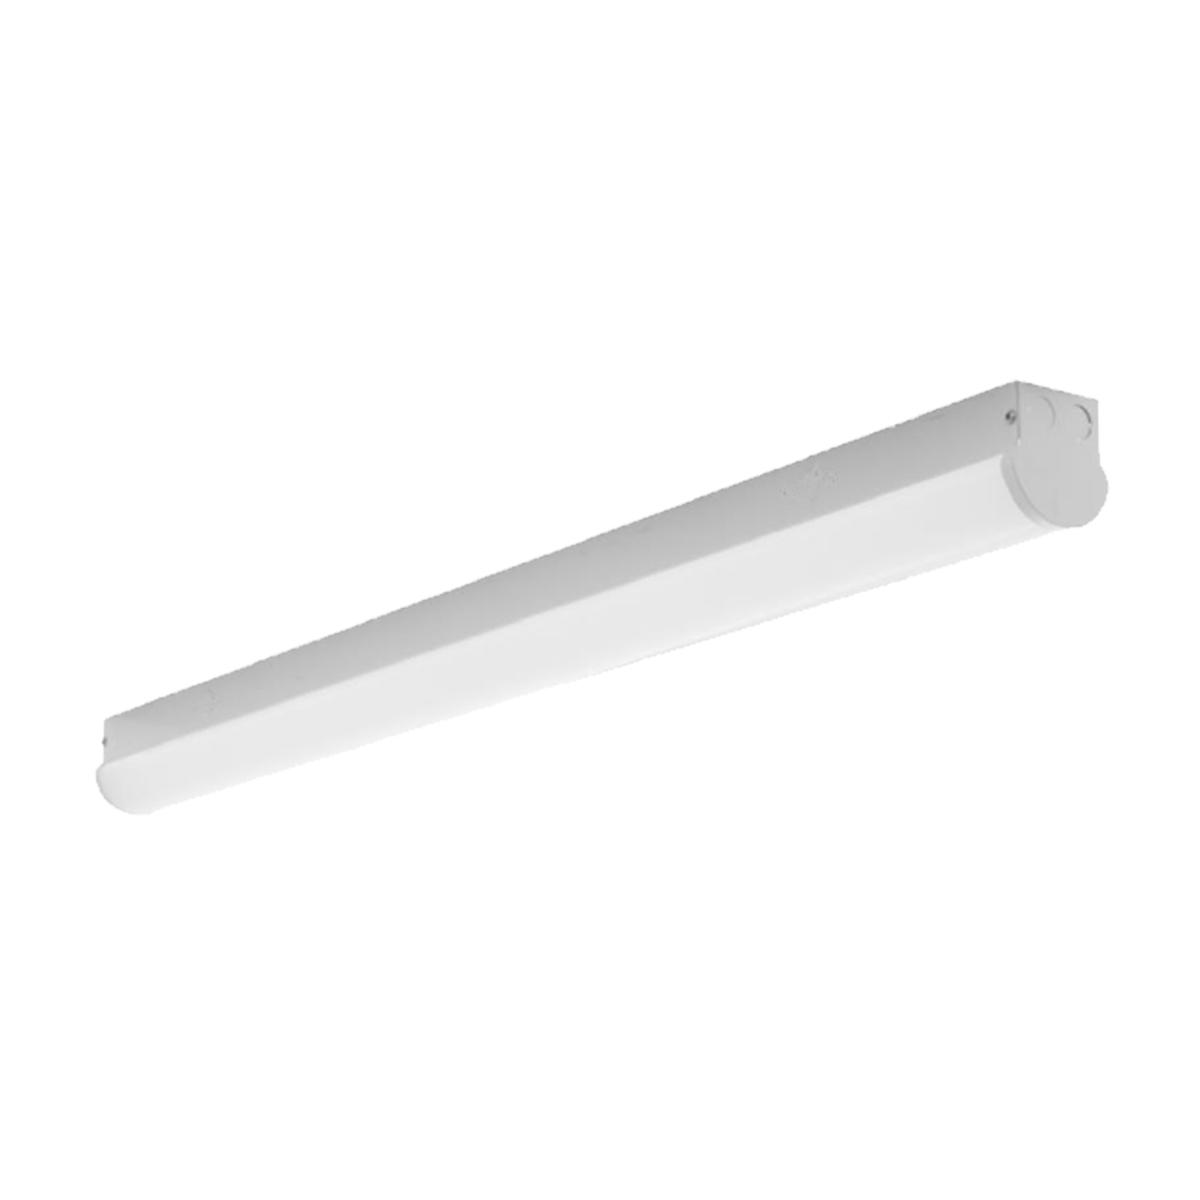 LED Linear Strip